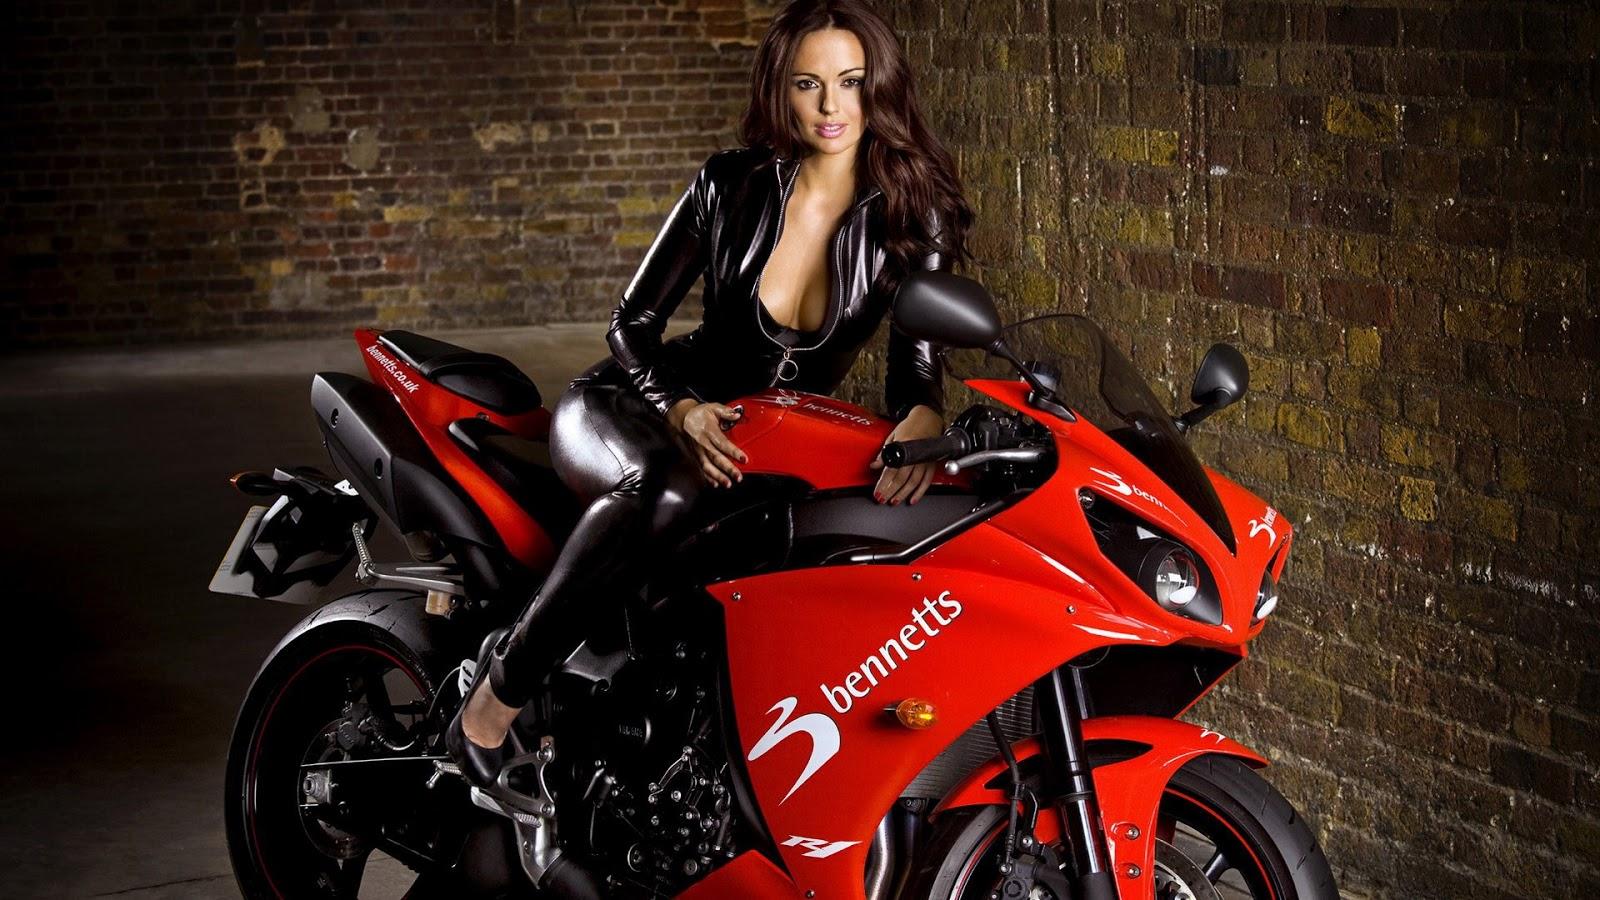 sexy girls bikes wallpapers - photo #2